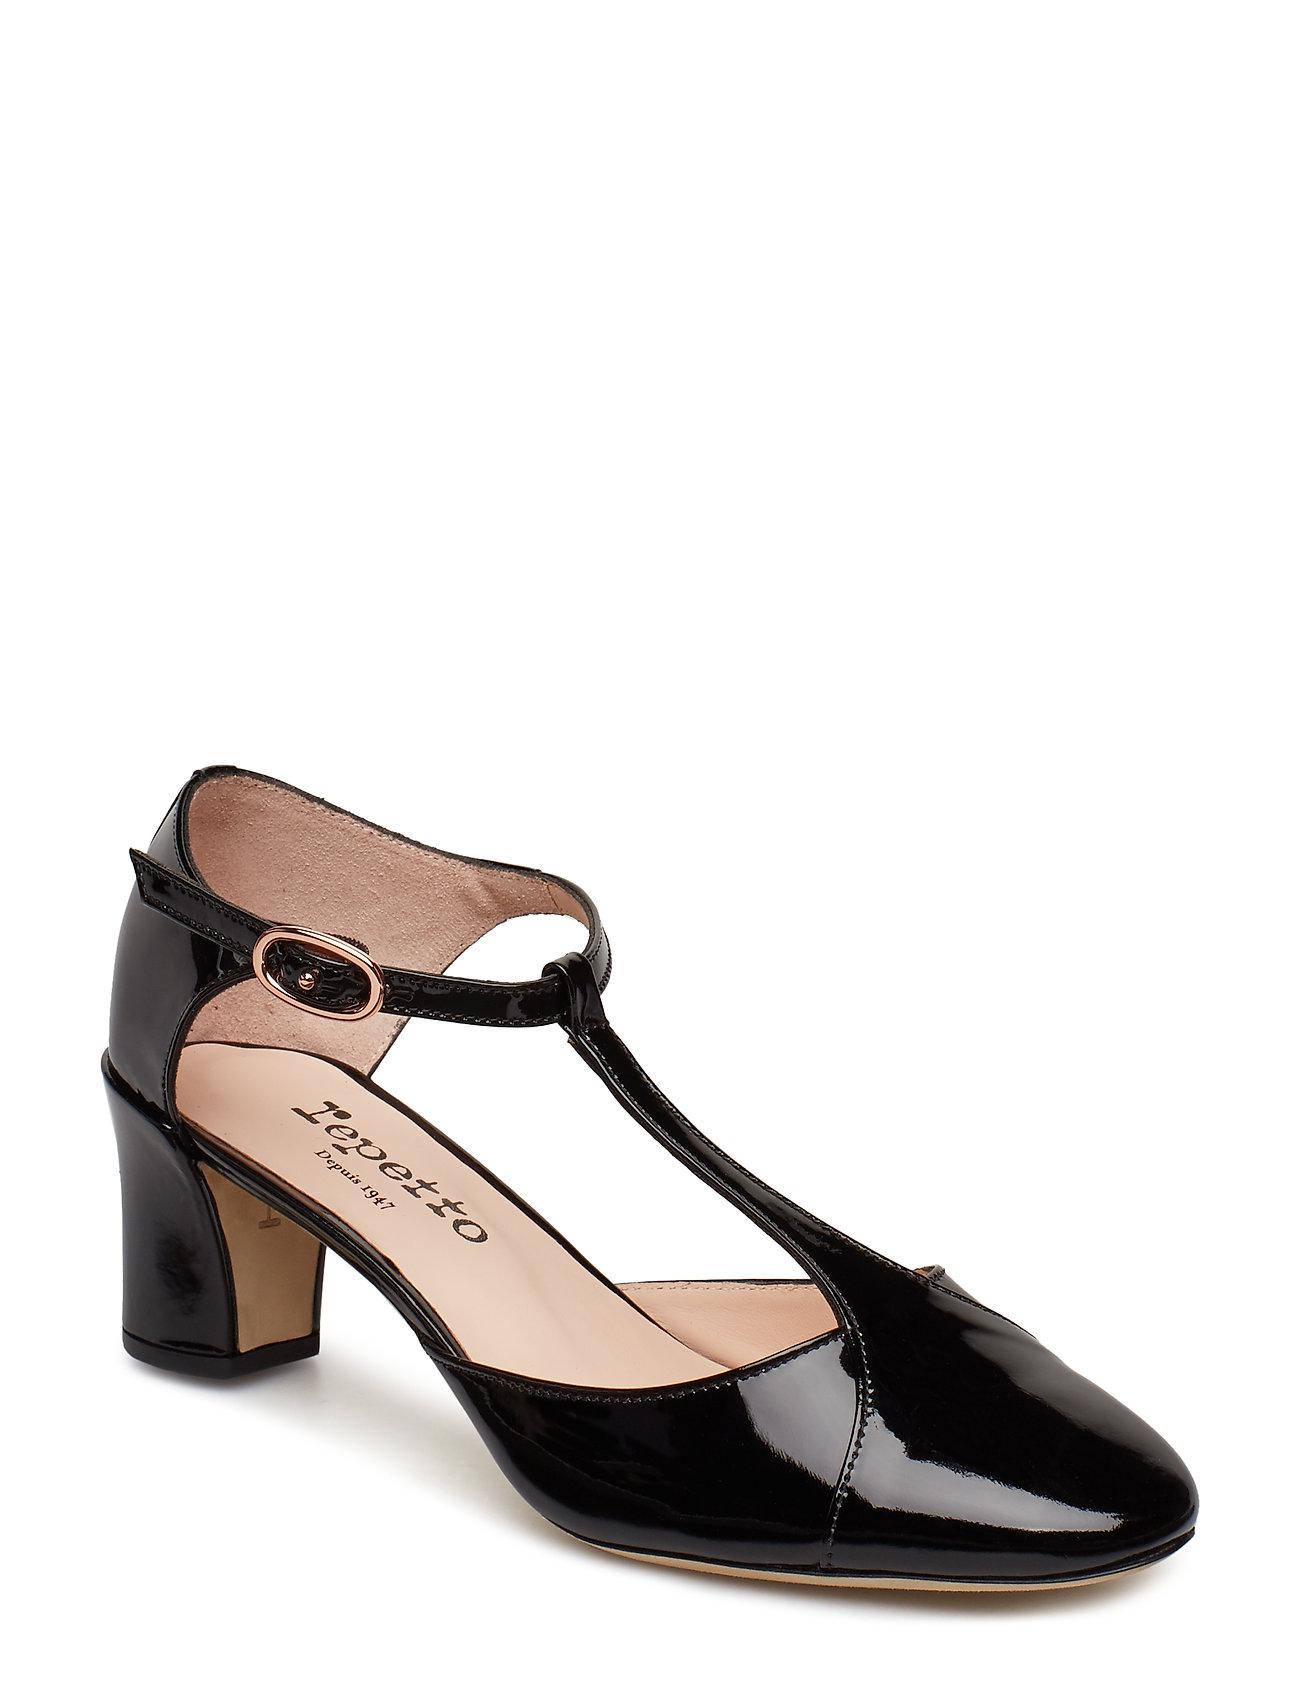 REPETTO PARIS Giuliet Sal6 Ad Shoes Heels Pumps Classic Schwarz REPETTO PARIS